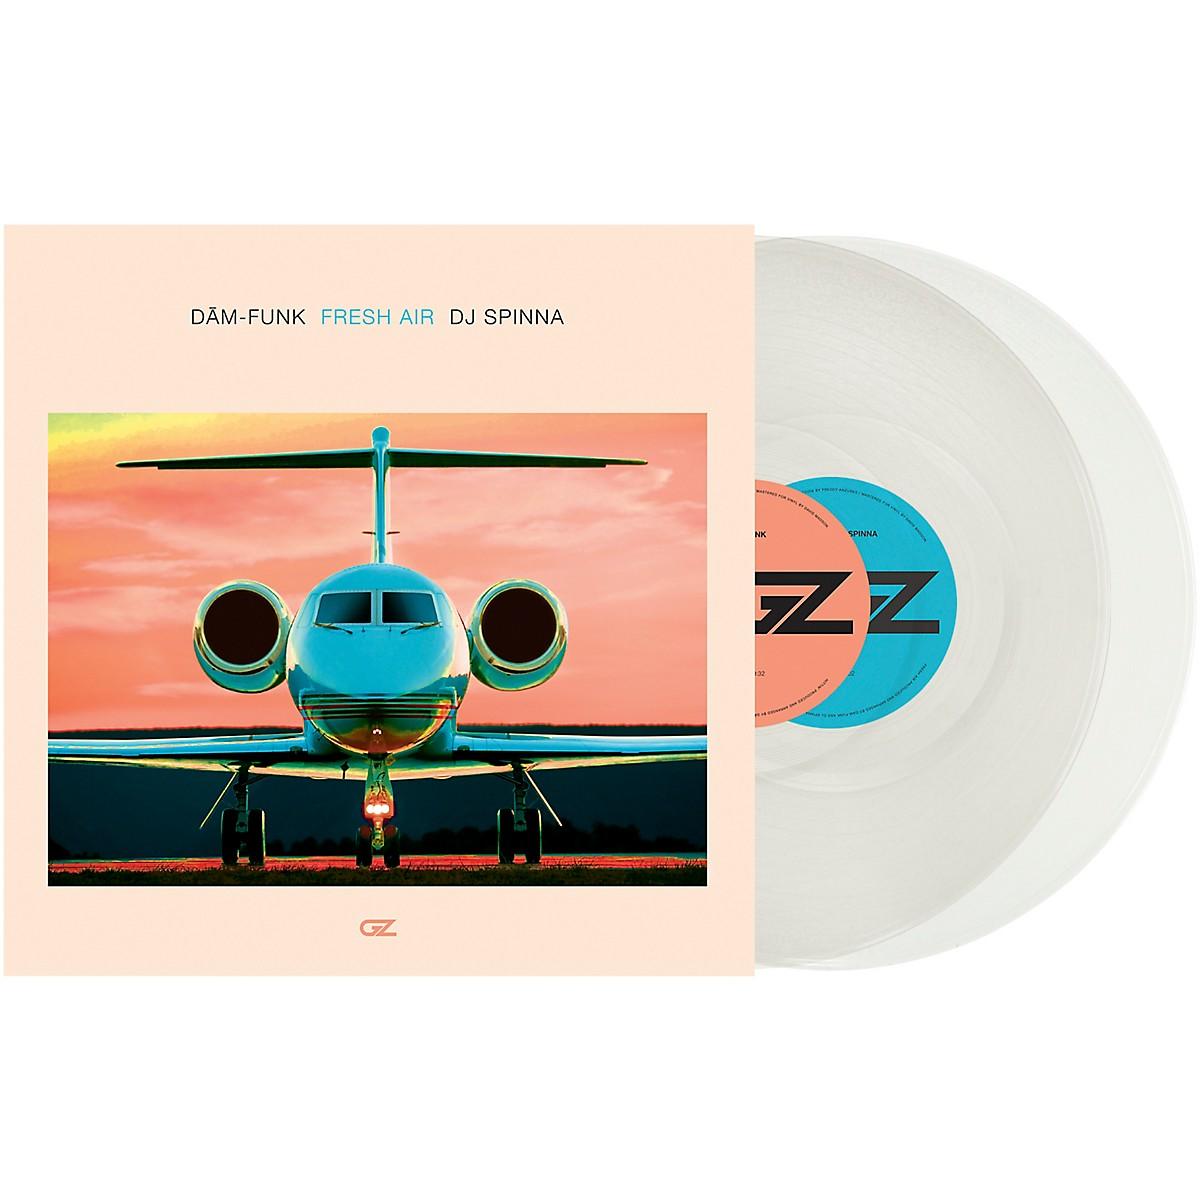 SERATO Dam-Funk NoiseMap Timecode Control Vinyl Pair